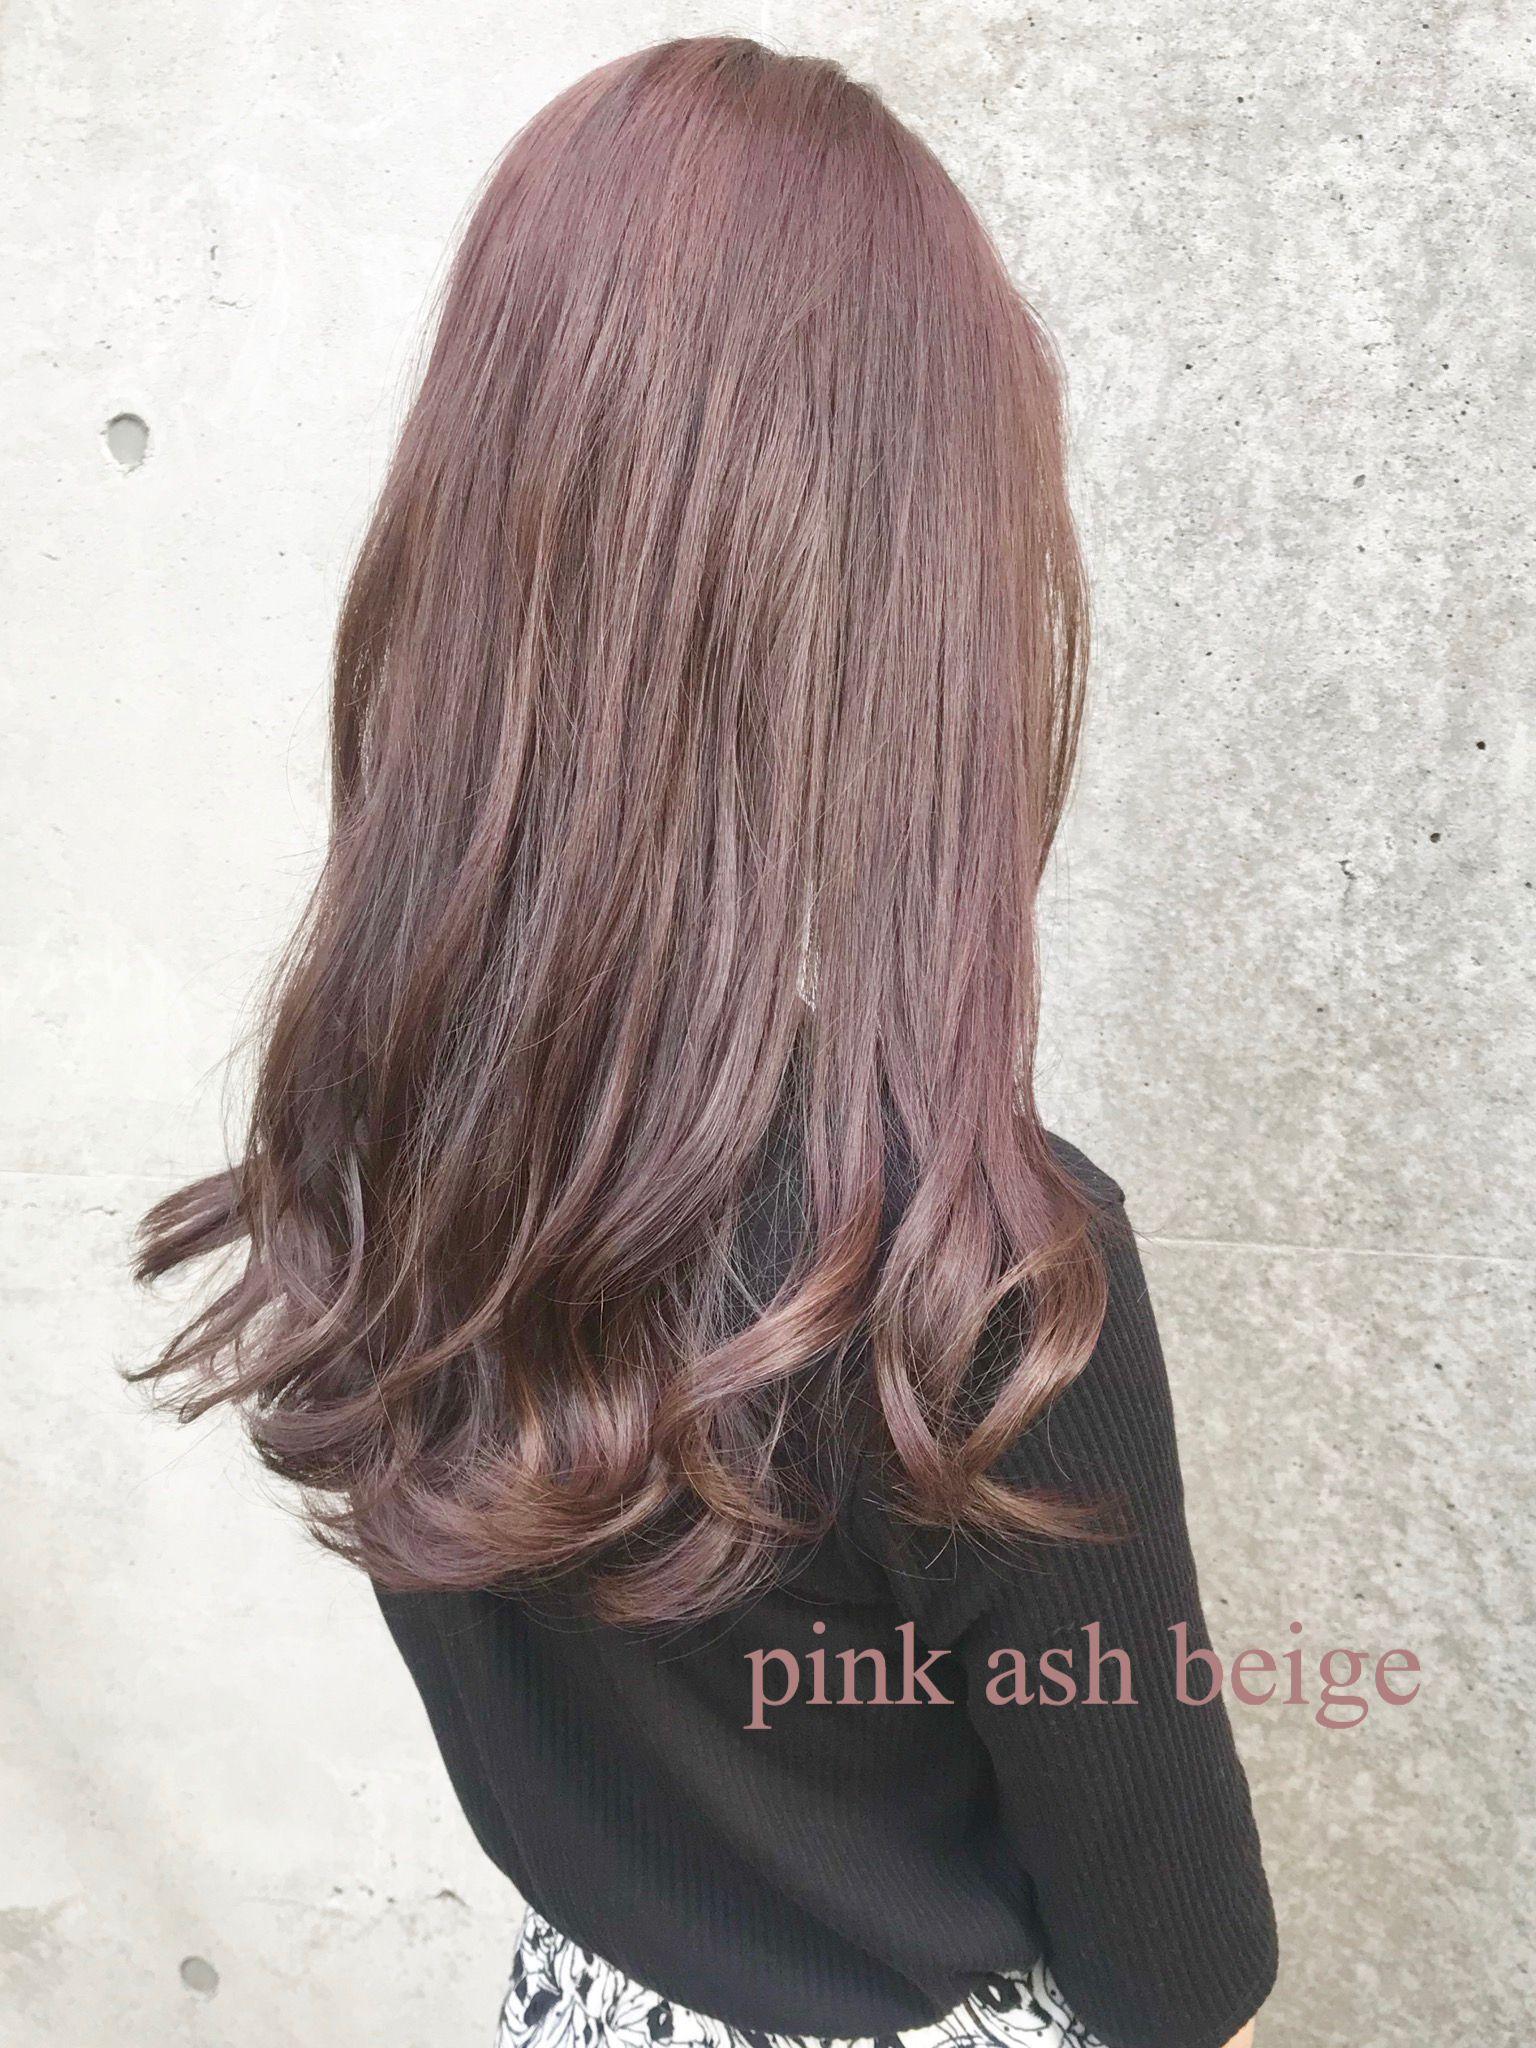 【FLOWERS矢野】 レッドブラウンボルドーカラー ピンク